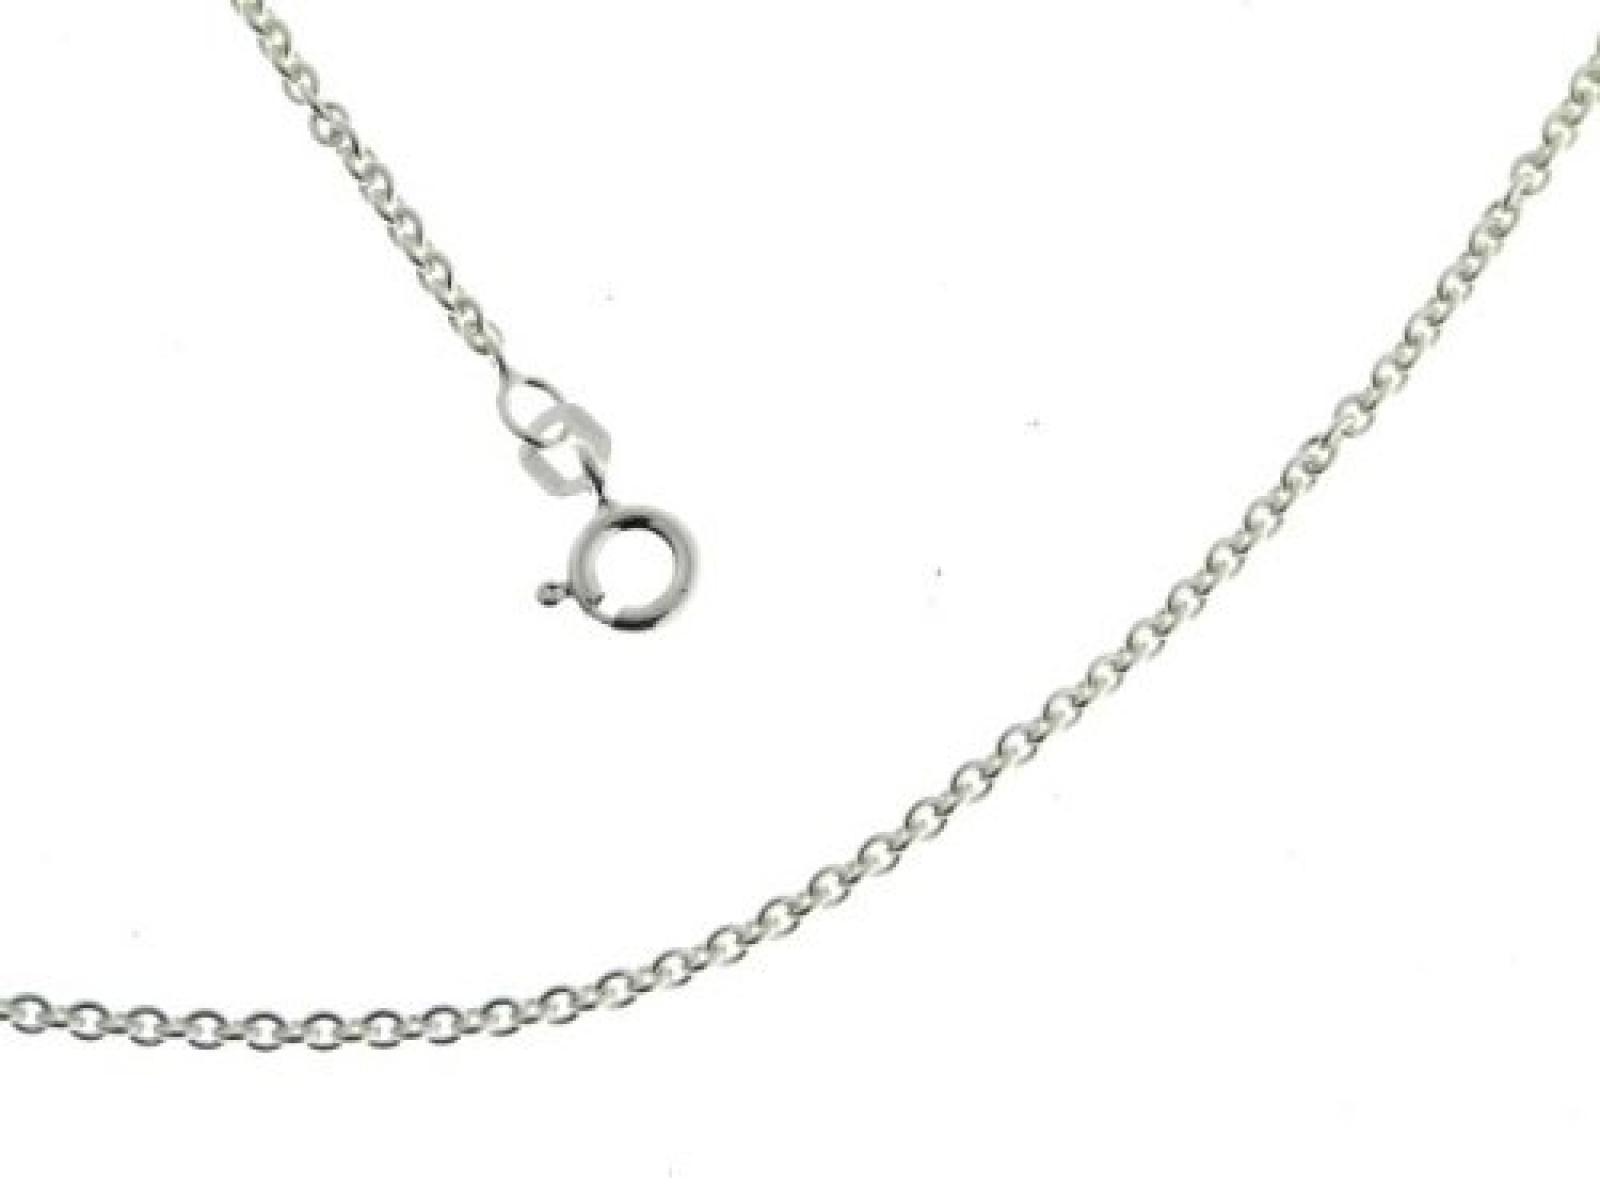 BOB C. Damen-Halskette ohne Anhänger Anker 925 Sterling Silber 326996